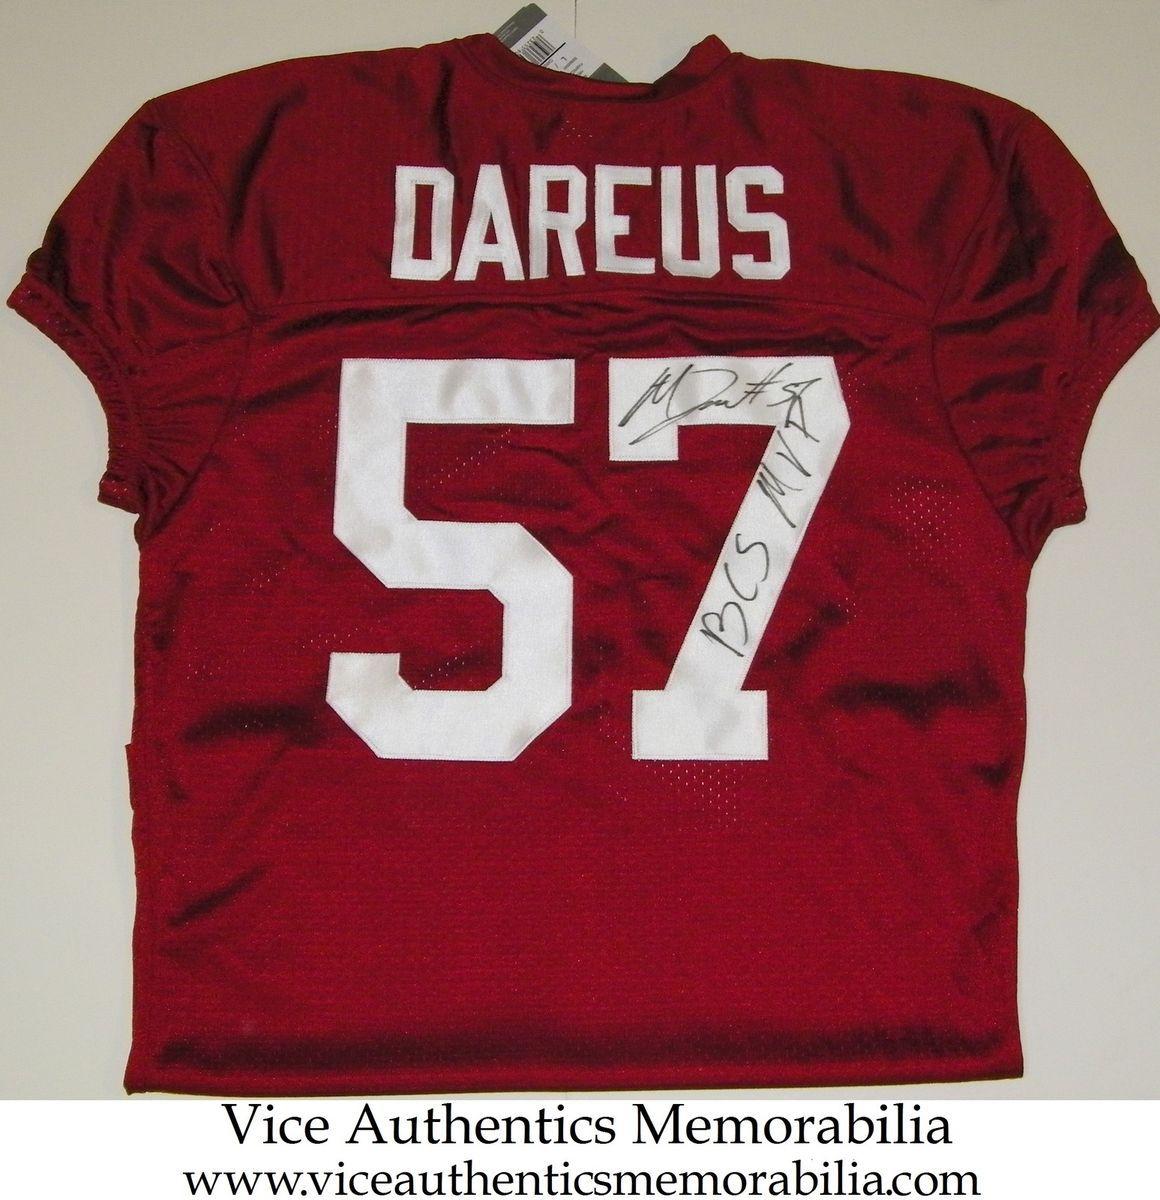 Marcell Dareus Signed Auto Alabama Crimson Tide Football Jersey w BCS